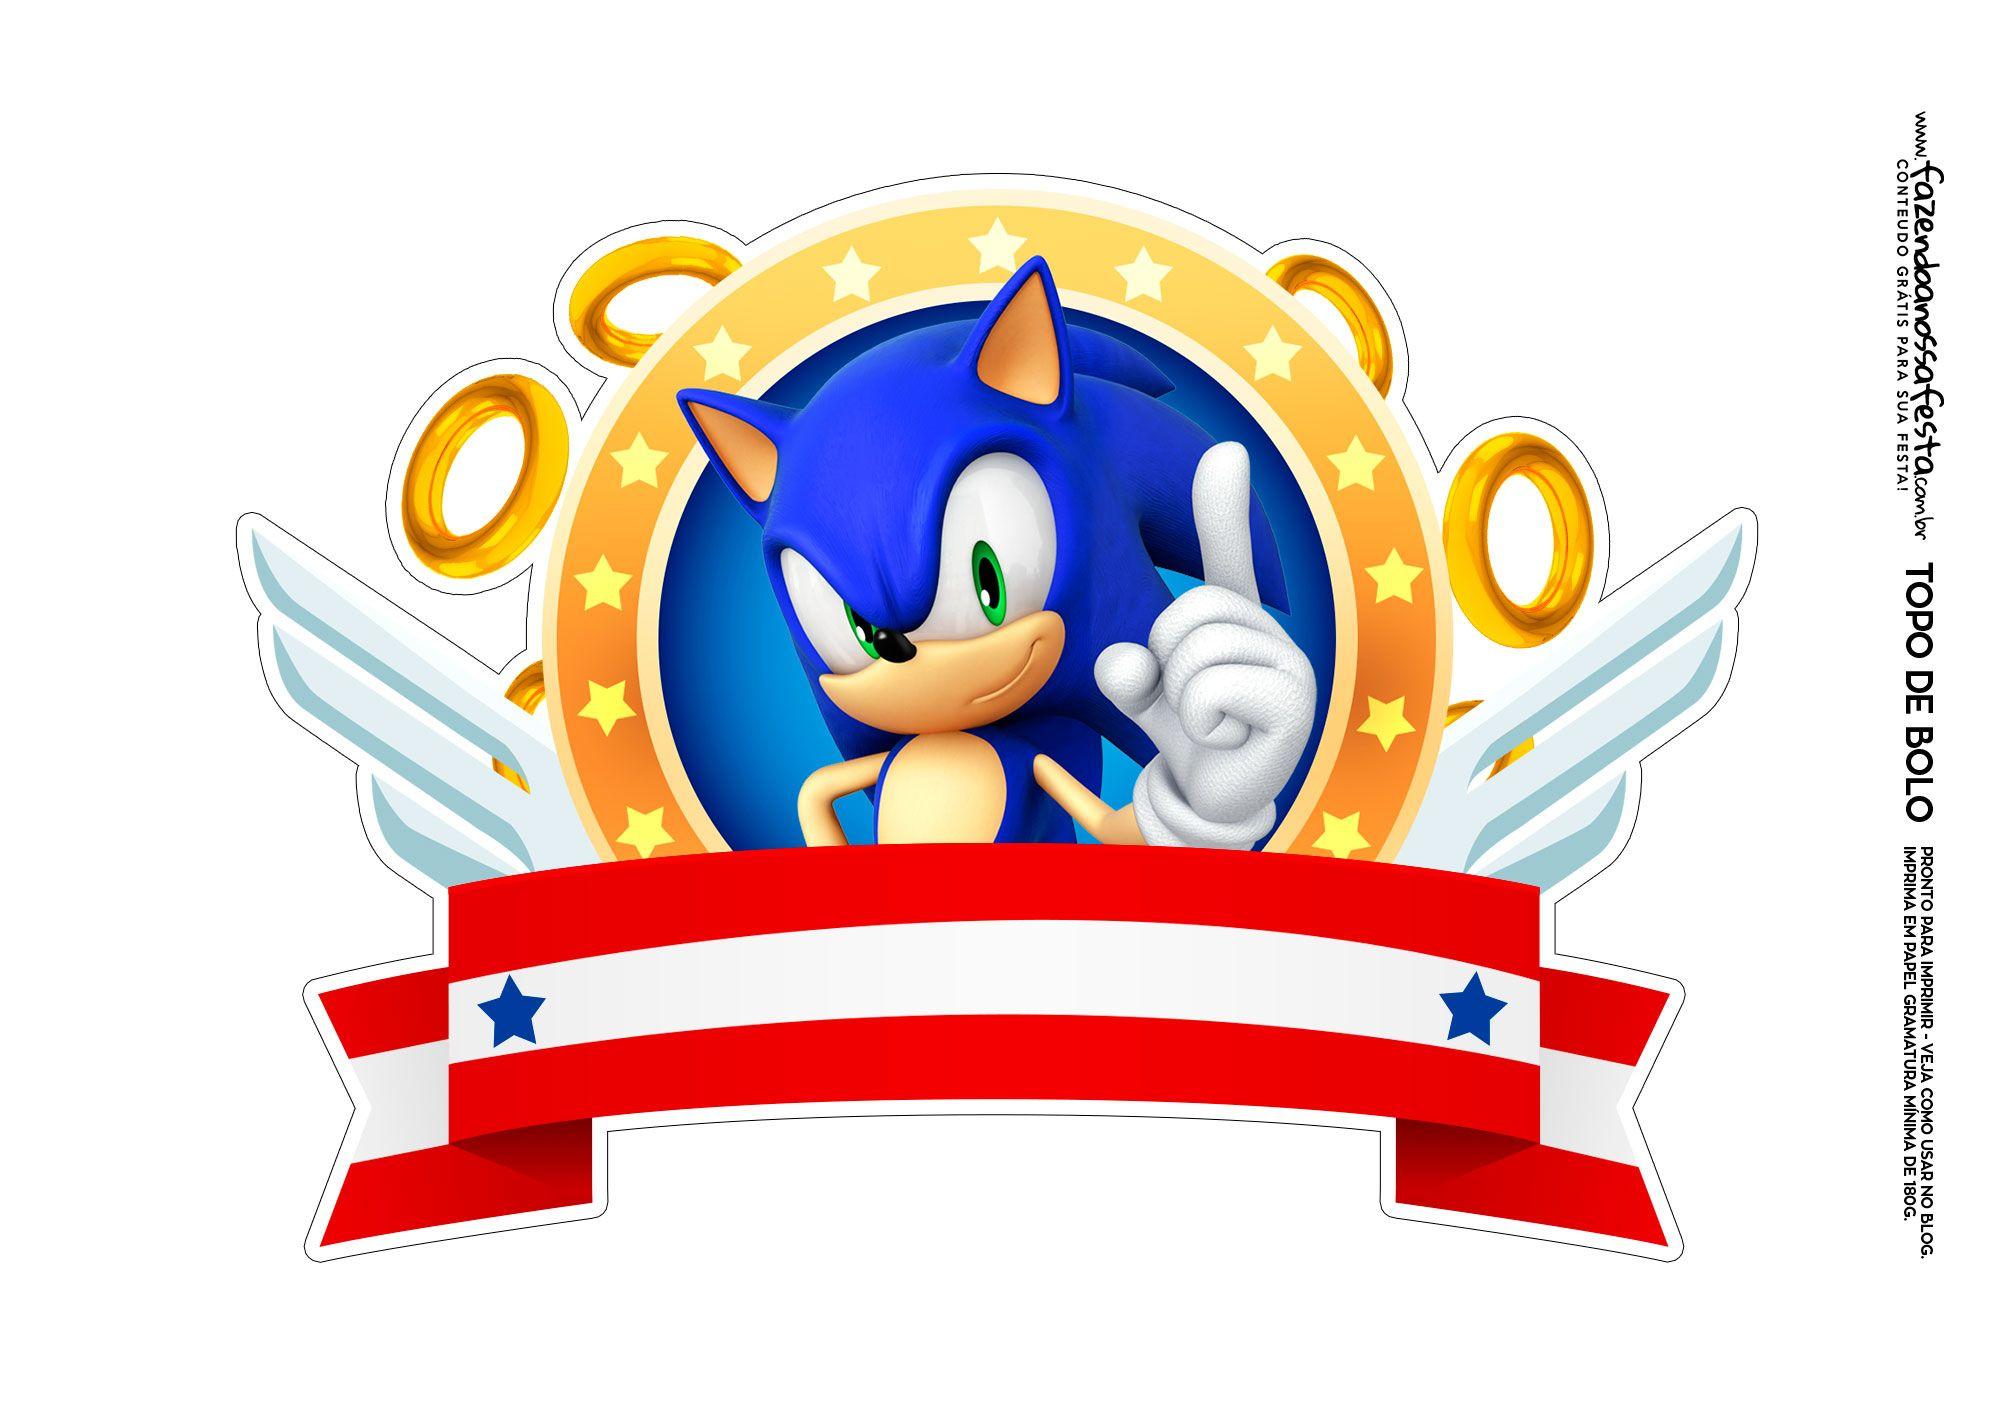 Topo De Bolo Sonic 3 Fazendo A Nossa Festa Festas De Aniversario Do Sonic Bolo De Aniversario Sonic Bolo Sonic